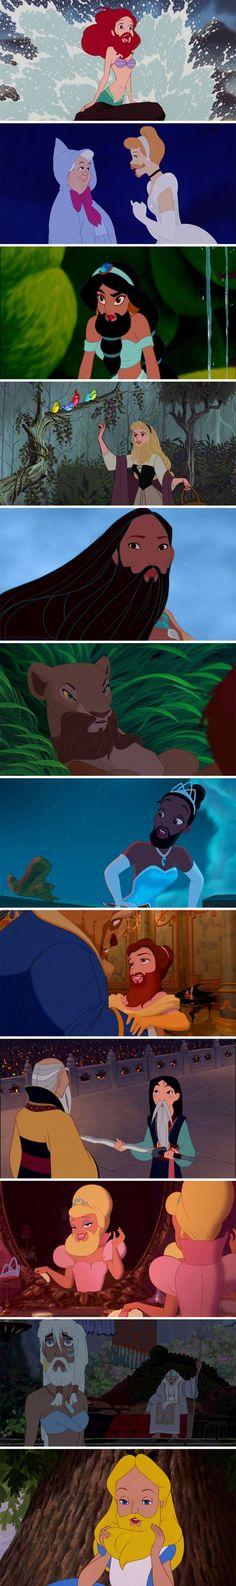 Disney princesses with beards. 'Nuff said. Hahahaha